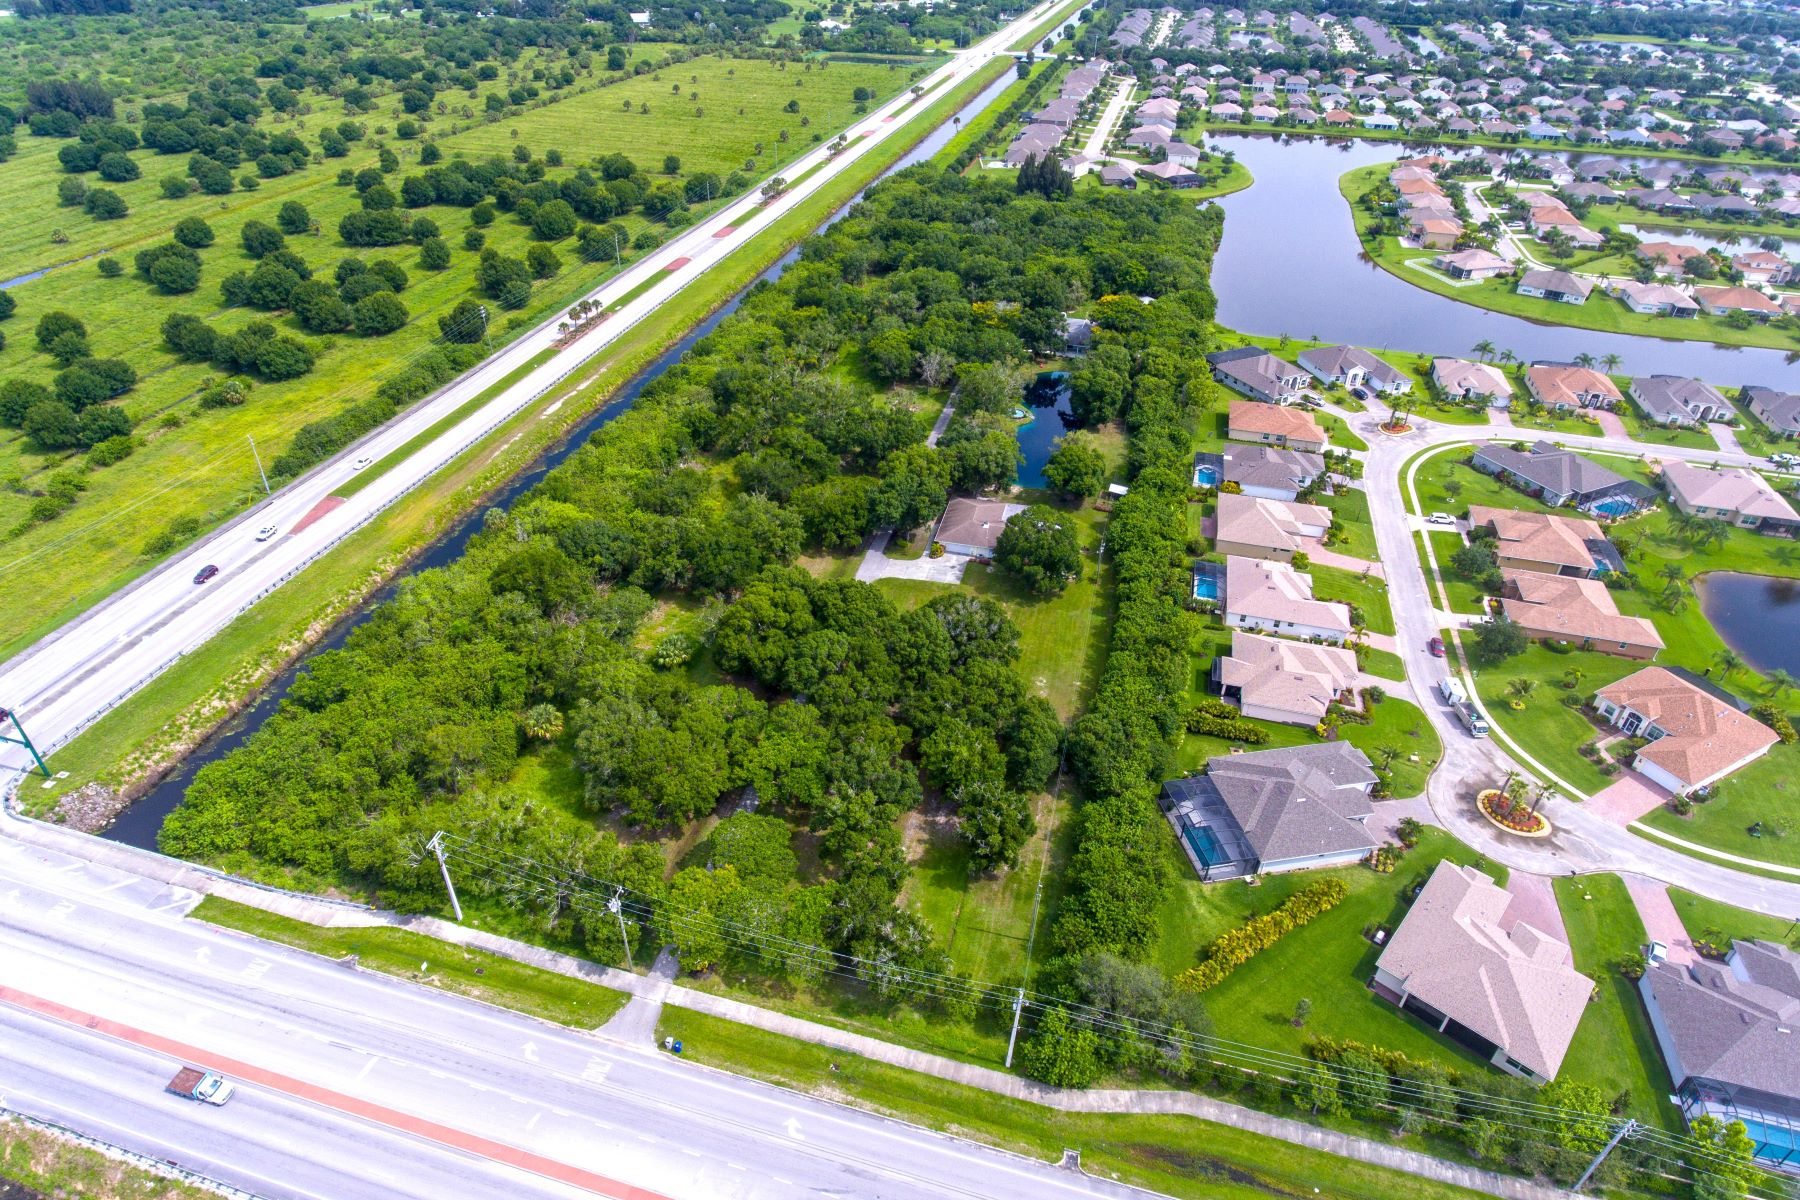 Land for Sale at 0 9th Street Sw, Vero Beach, FL 0 9th Street Sw Vero Beach, Florida 32960 United States